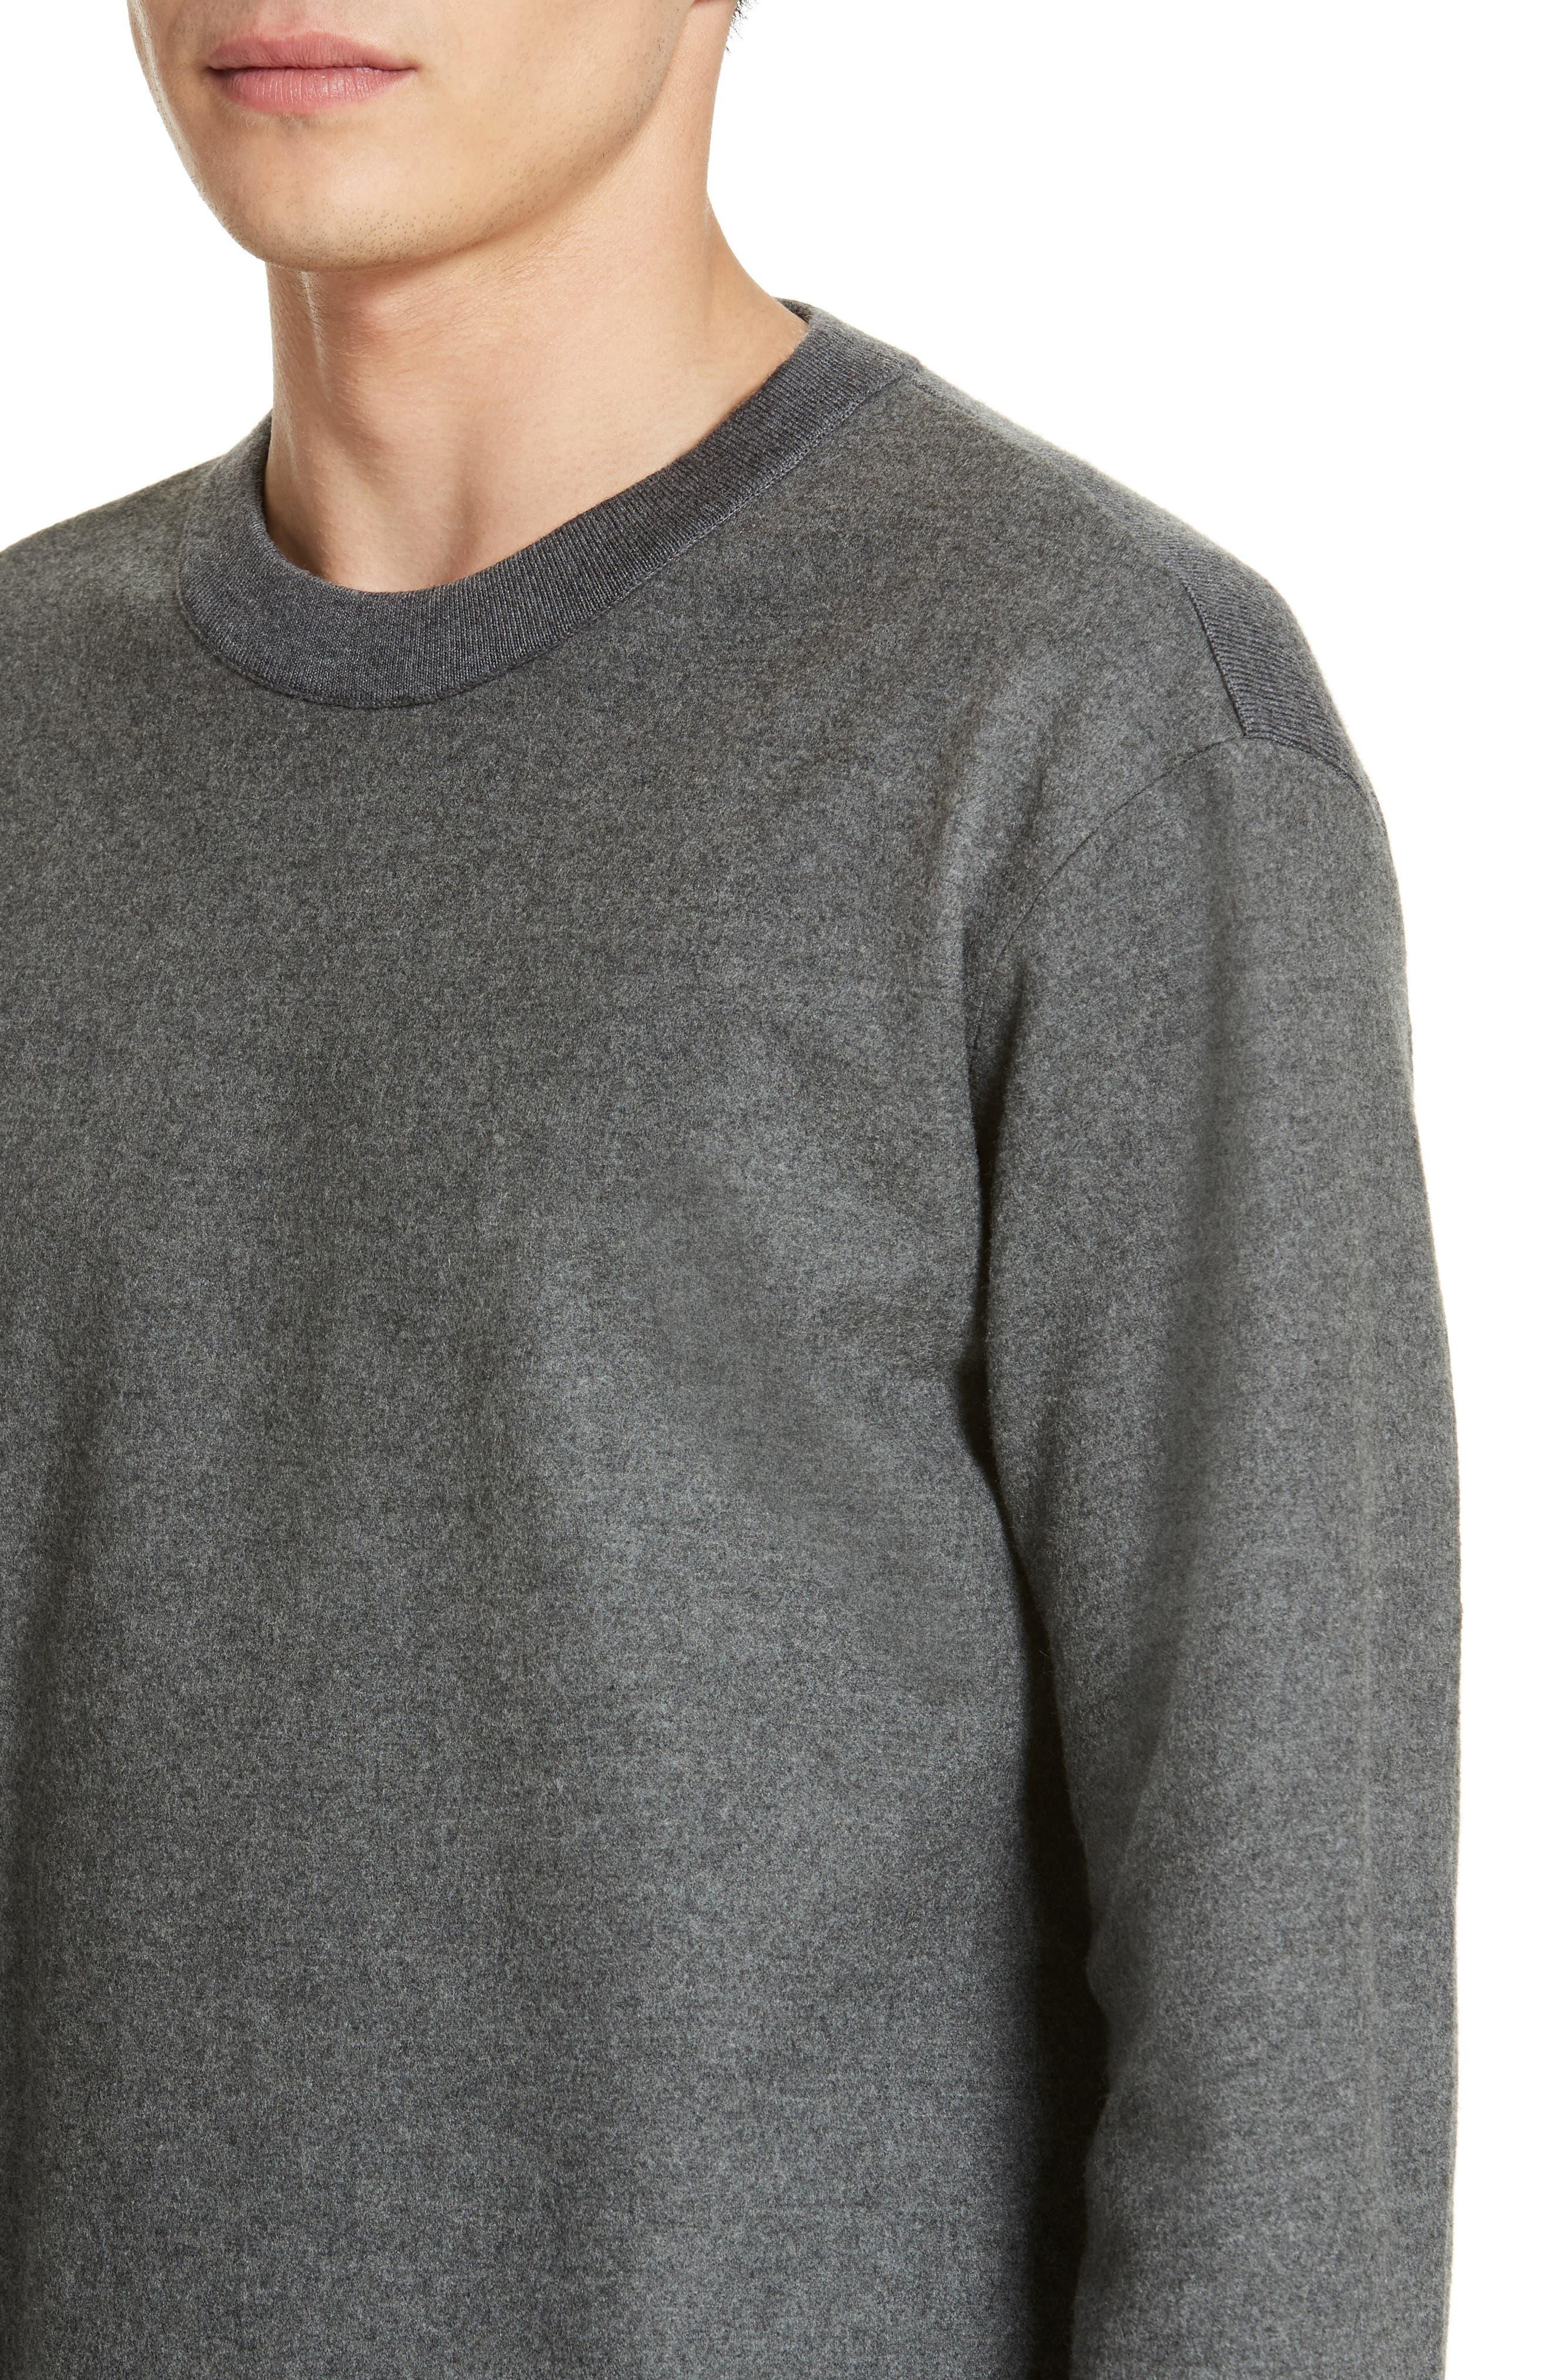 Hyper Compress Sweatshirt,                             Alternate thumbnail 4, color,                             020